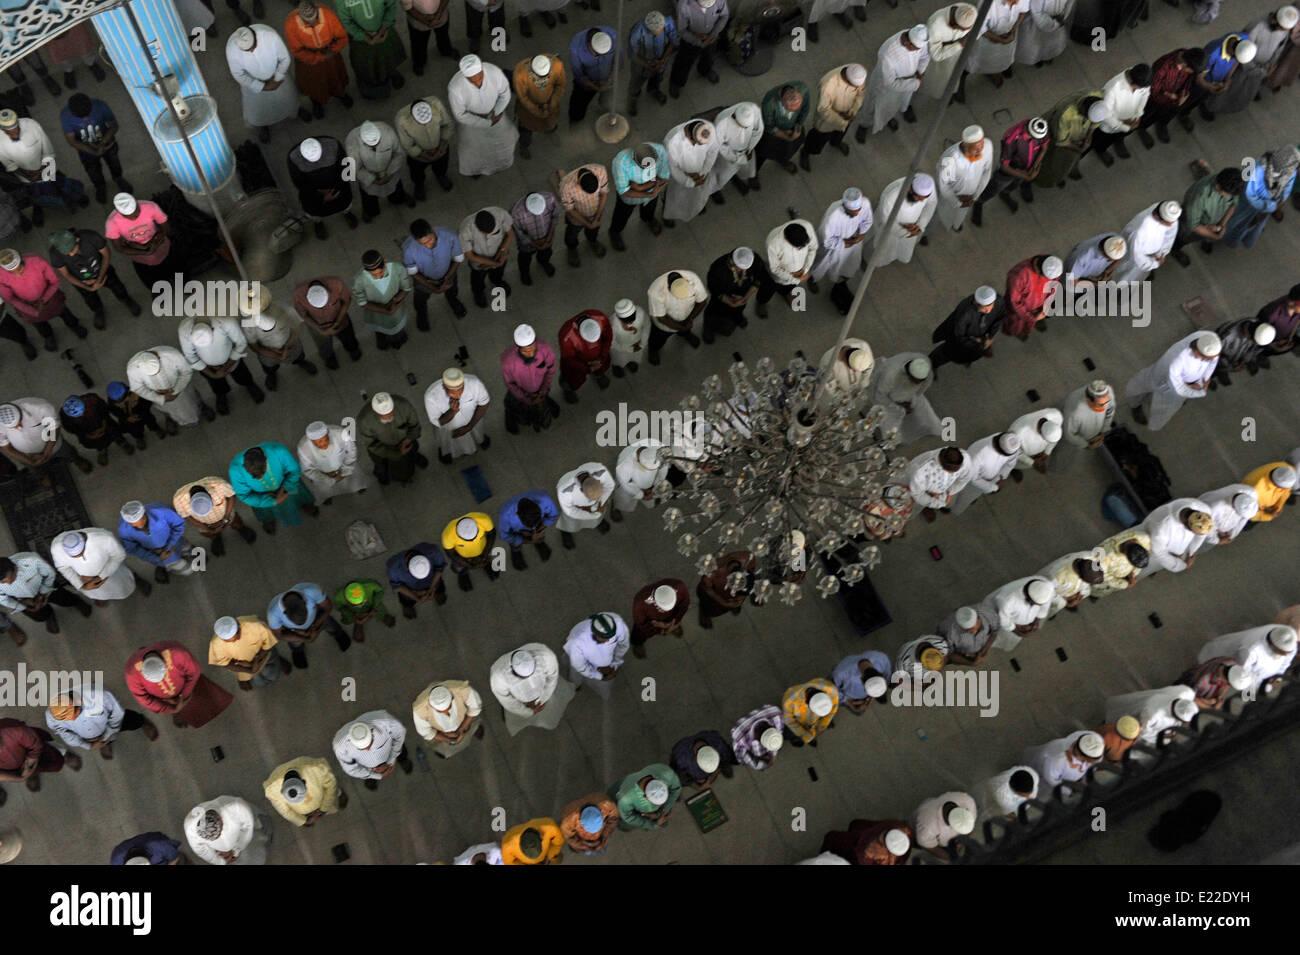 Dhaka, Bangladesh. 13th June 2014. Prayers in Baitulmokaram mosque in Dhaka. Muslims across the country will observe Stock Photo